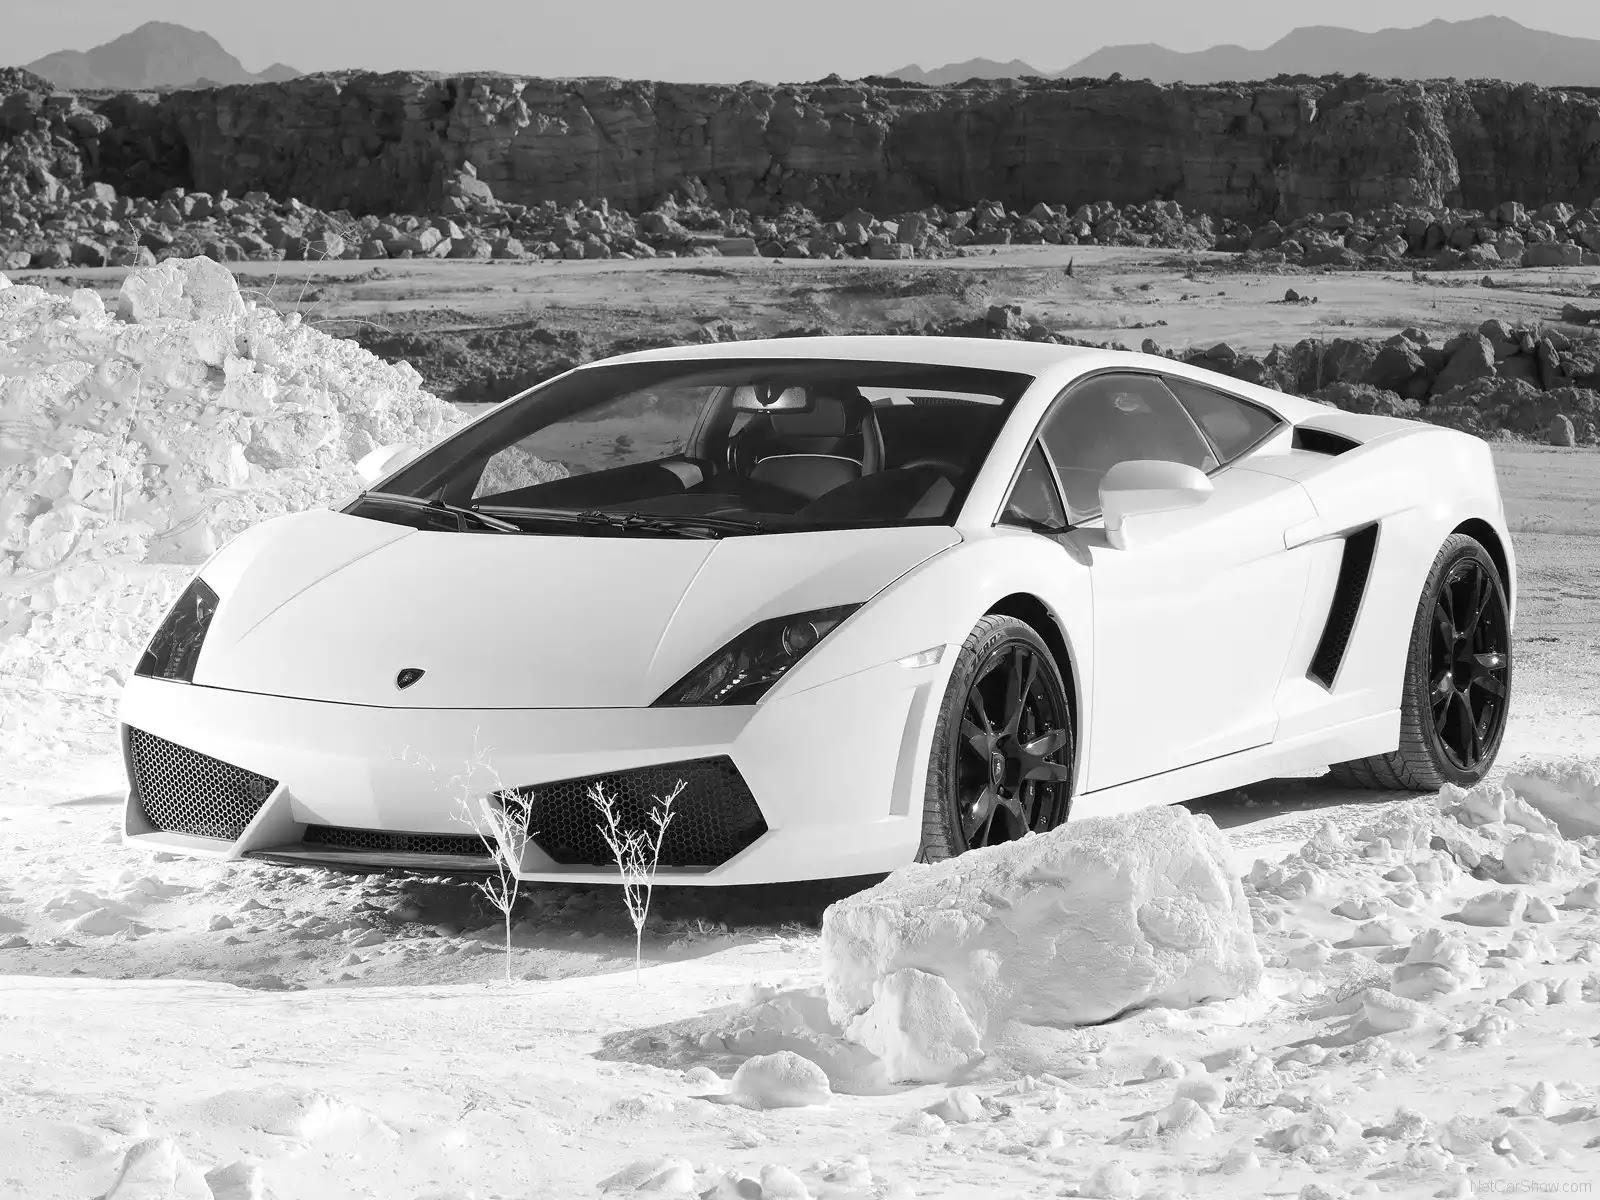 Hình ảnh siêu xe Lamborghini Gallardo LP560-4 2009 & nội ngoại thất